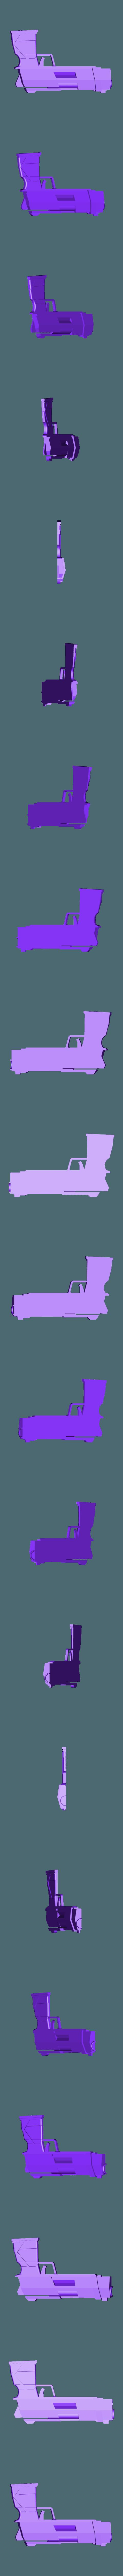 raz3.stl Download STL file Gun for a cosplay • 3D printer model, URkA